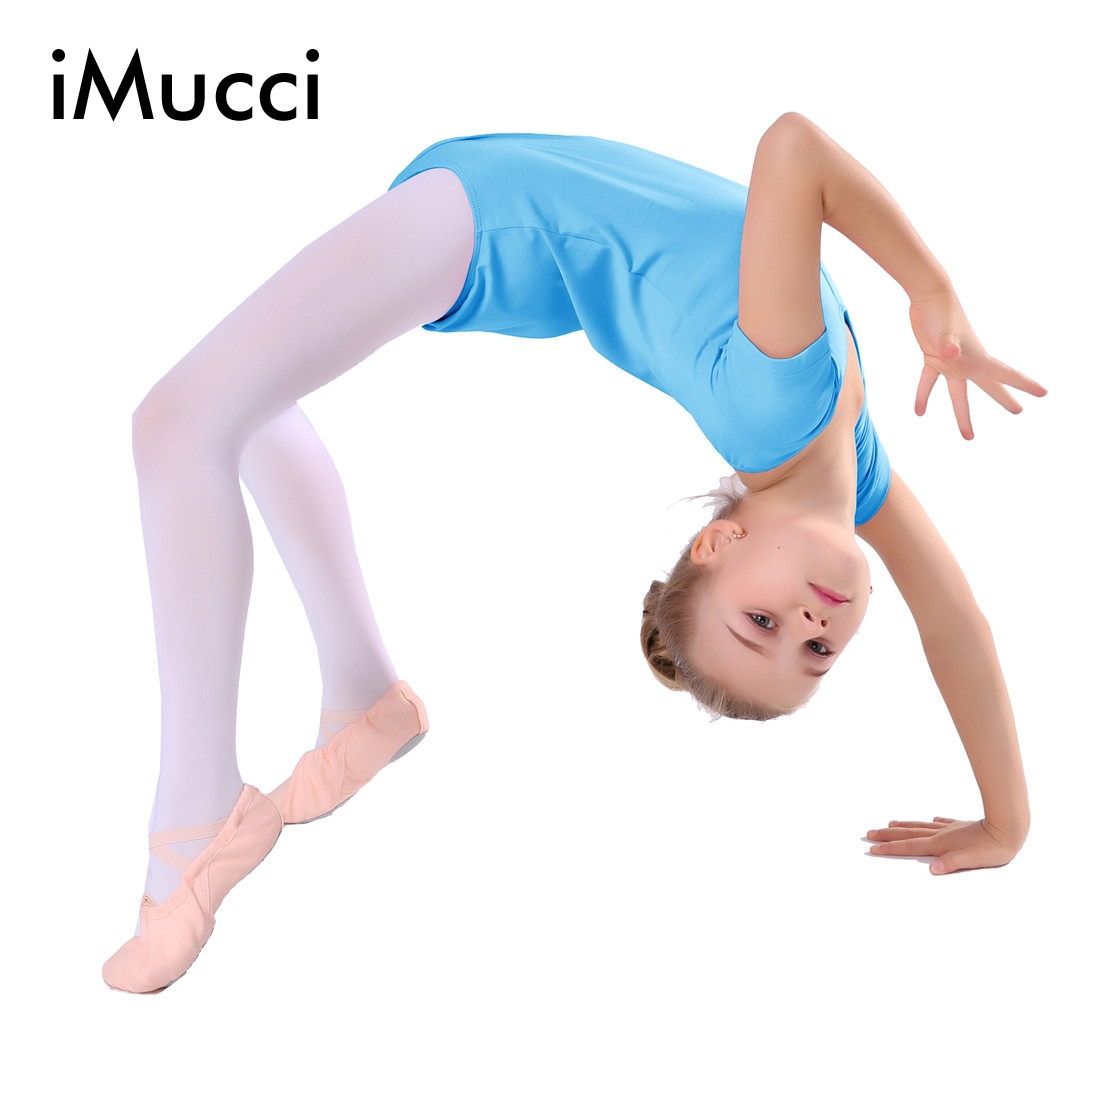 iMucci Short Sleeve Cotton Girl Ballet Unitard 100-150cm Gymnastic Leotards Blue Pink Rose Kids Ballerina Dancewear Gril Gift